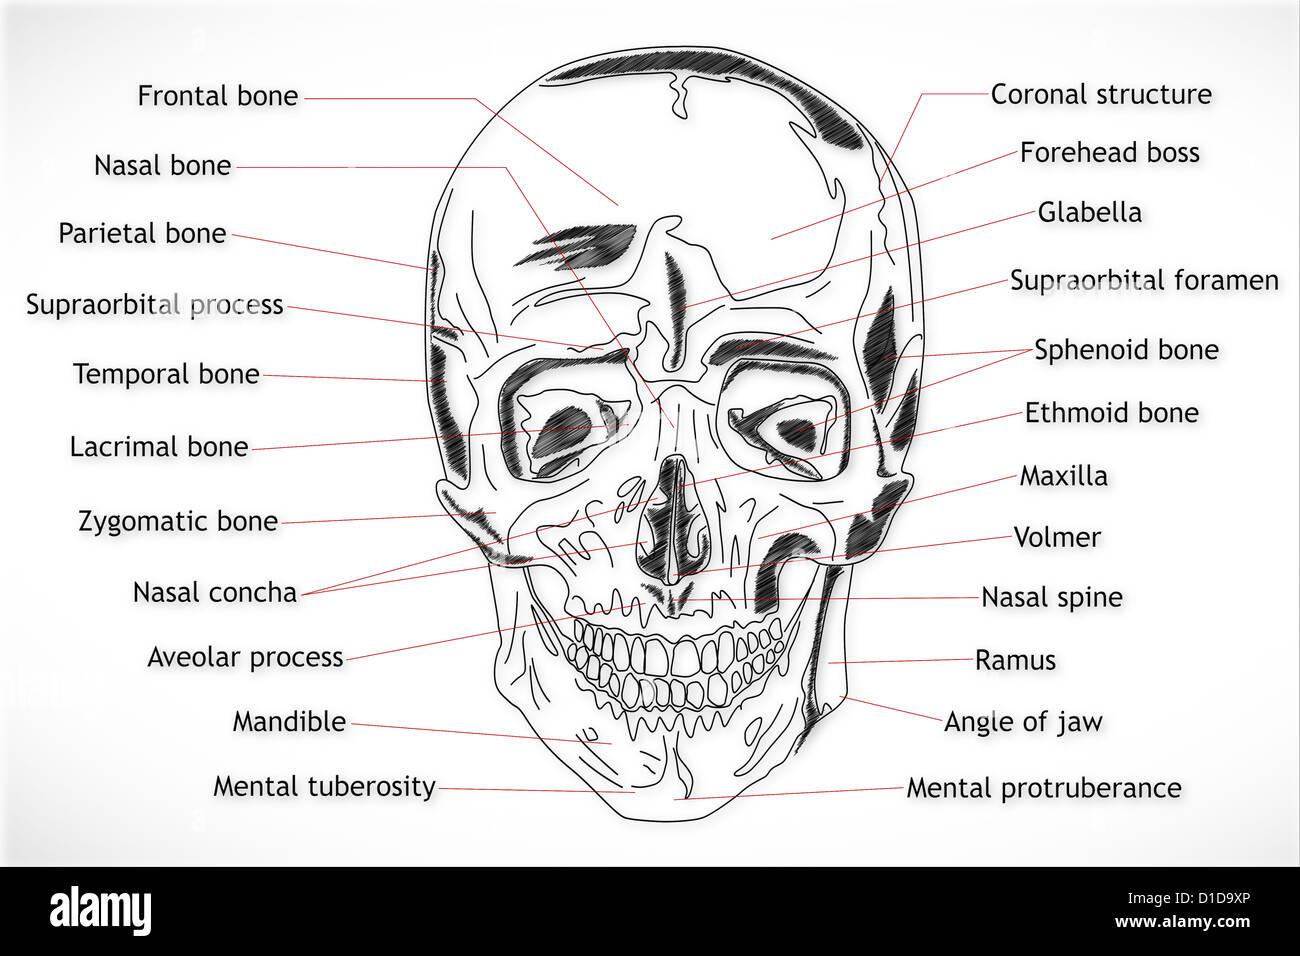 Sphenoid Bone Stock Photos Sphenoid Bone Stock Images Page 3 Alamy